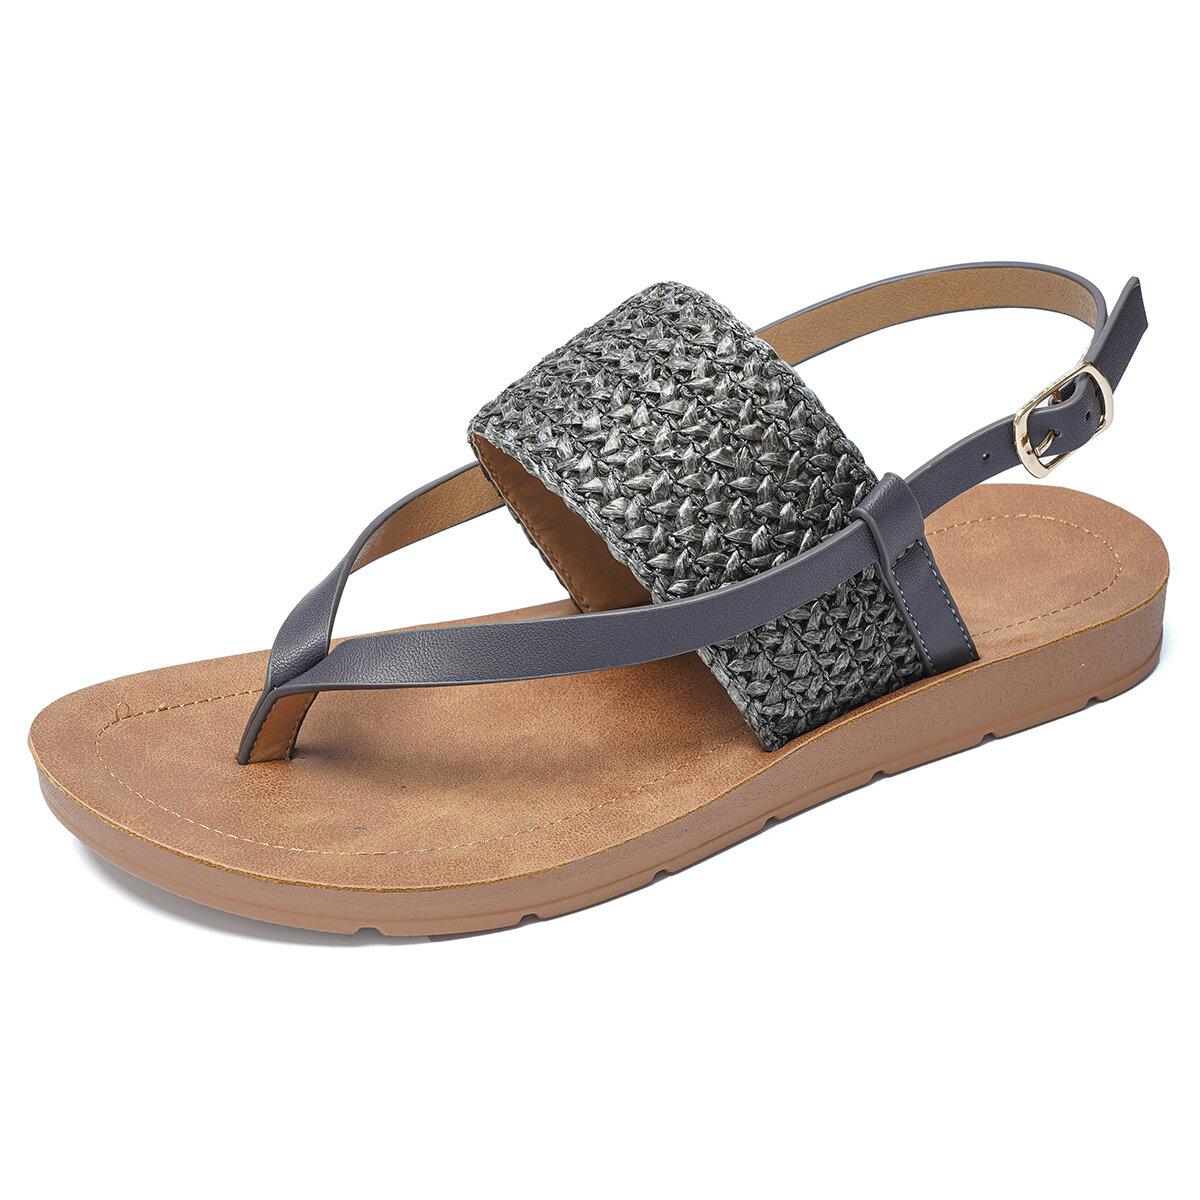 Clip Toe Knitted Flip Flops Casual Summer Slingback Sandals